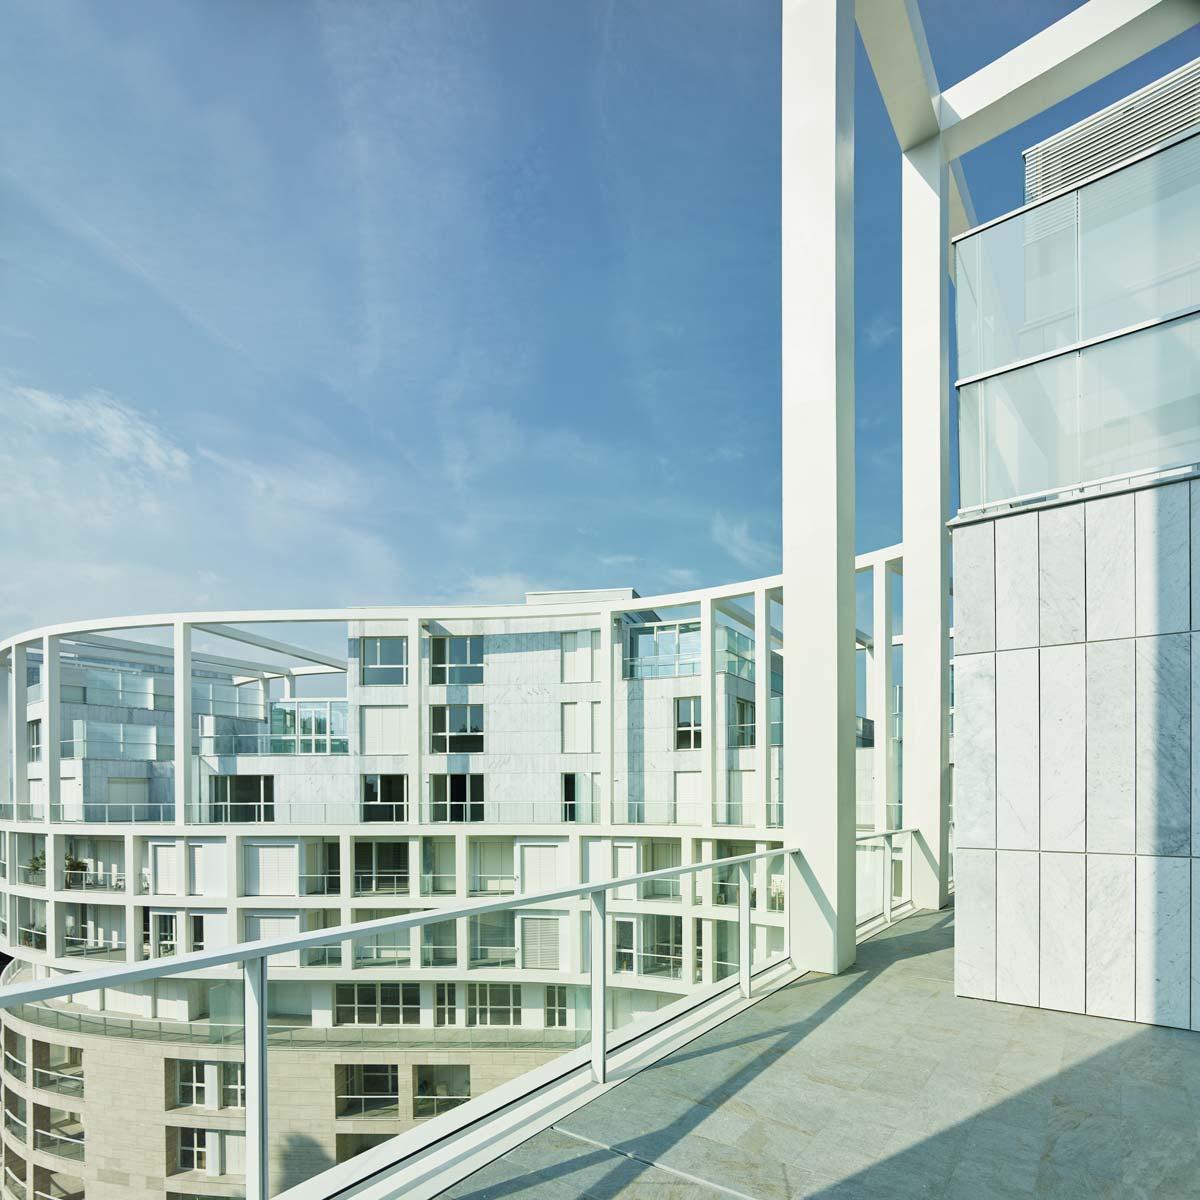 Degli-Esposti-Architetti-Milan-Residenze-Carlo-Erba-14